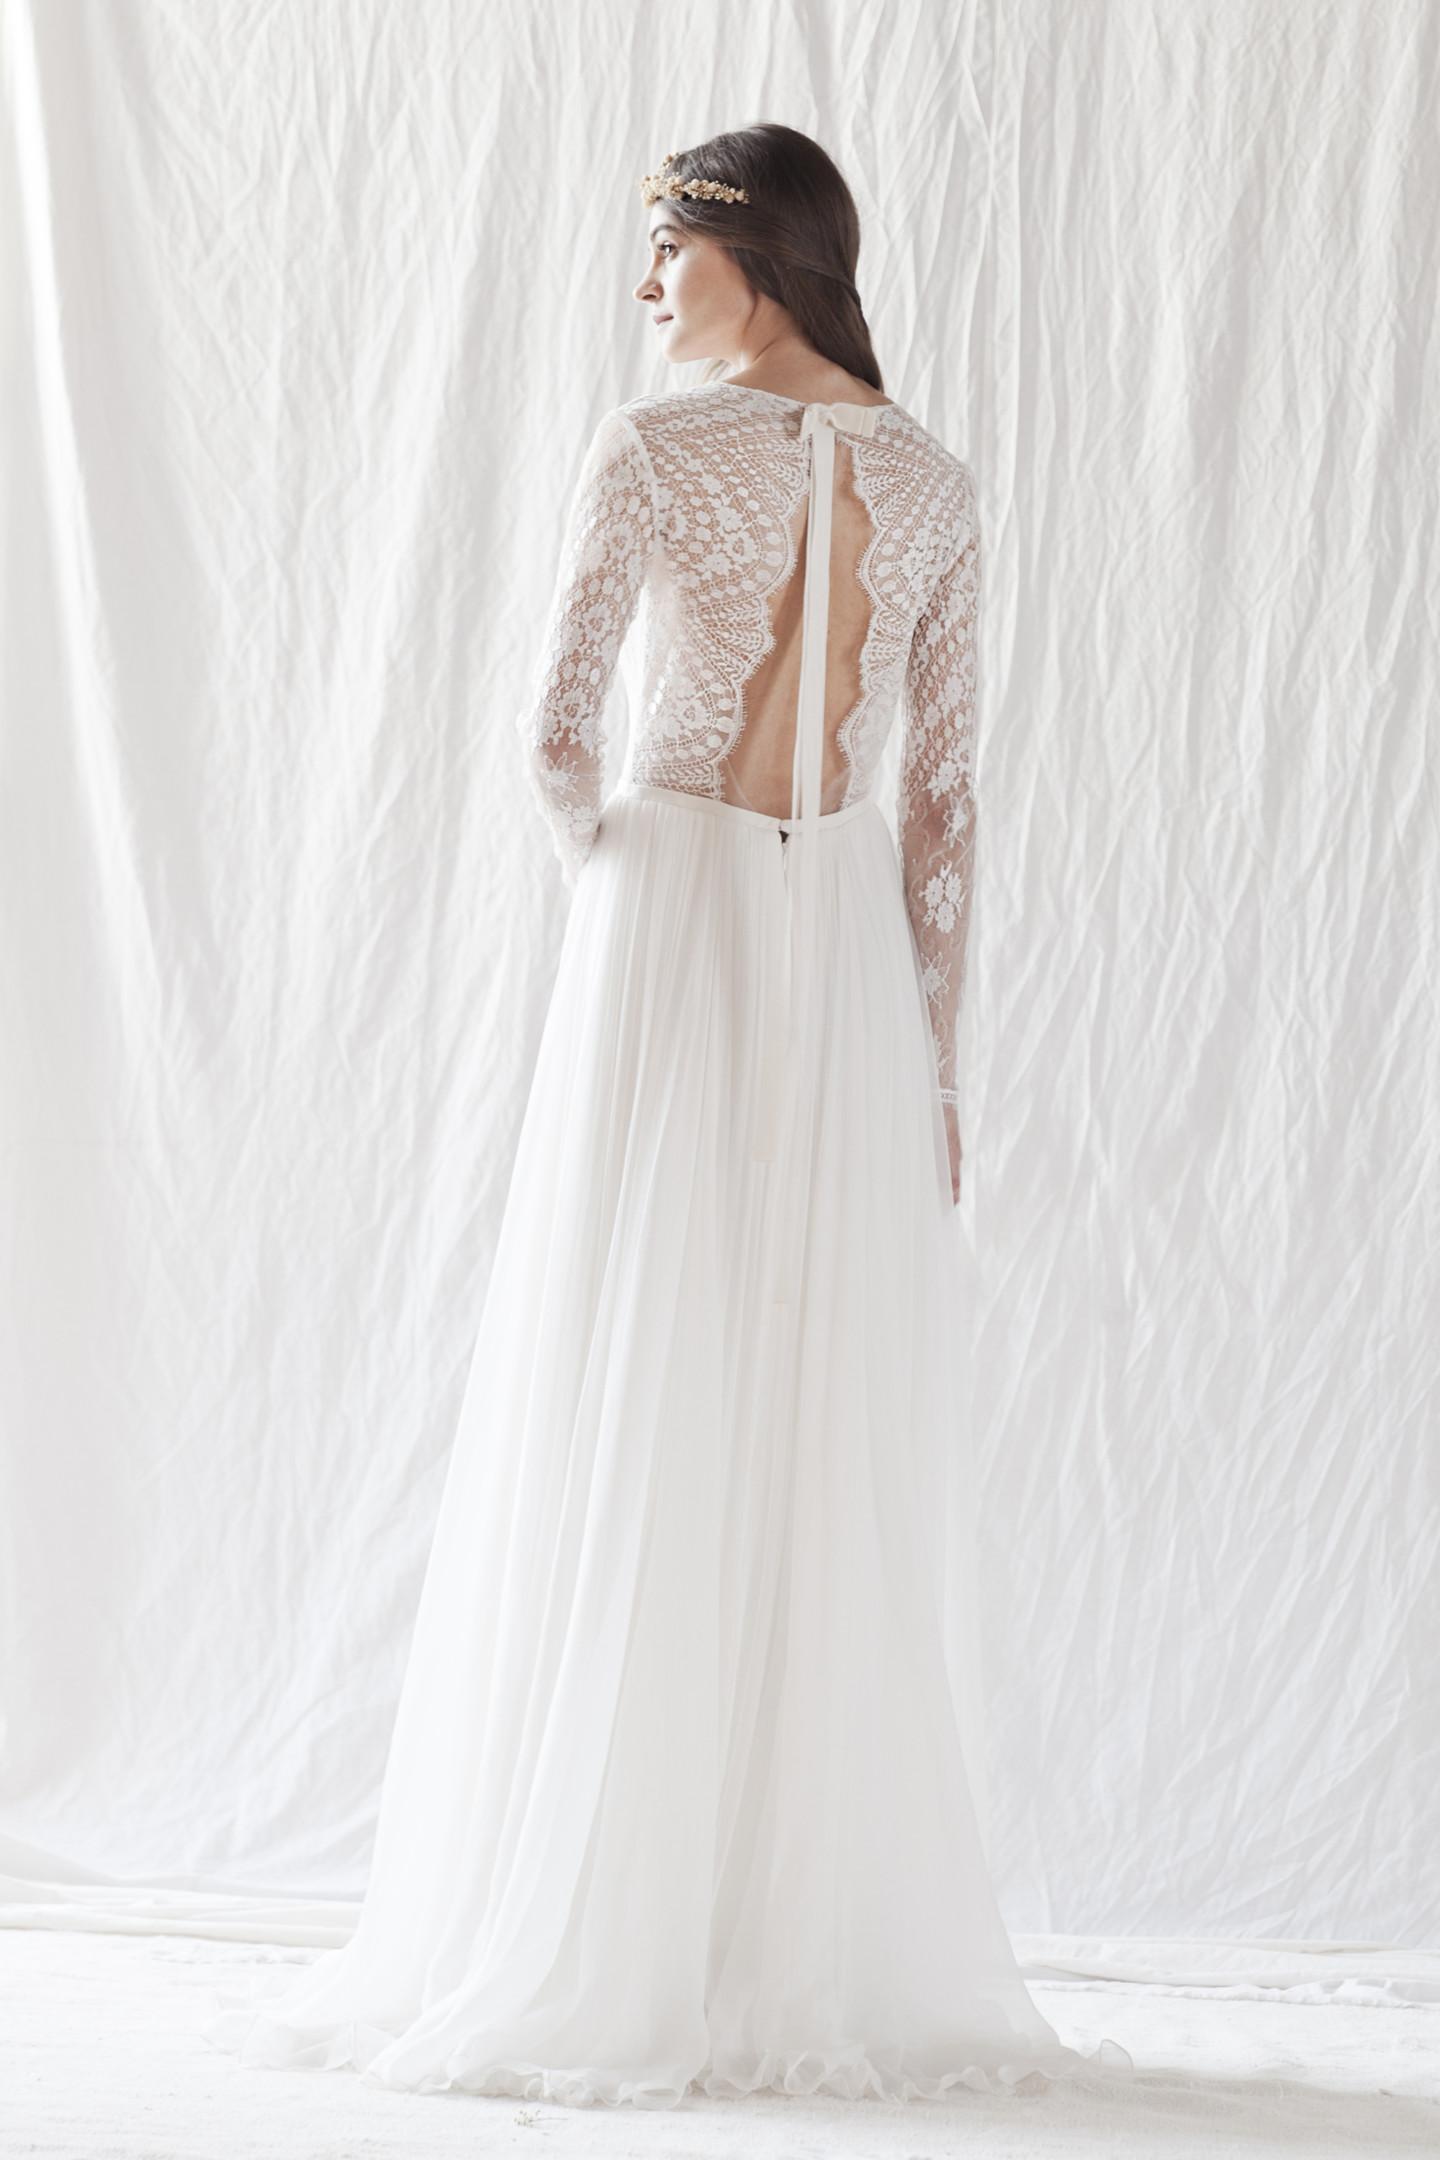 Blush Dress by Divine Atelier